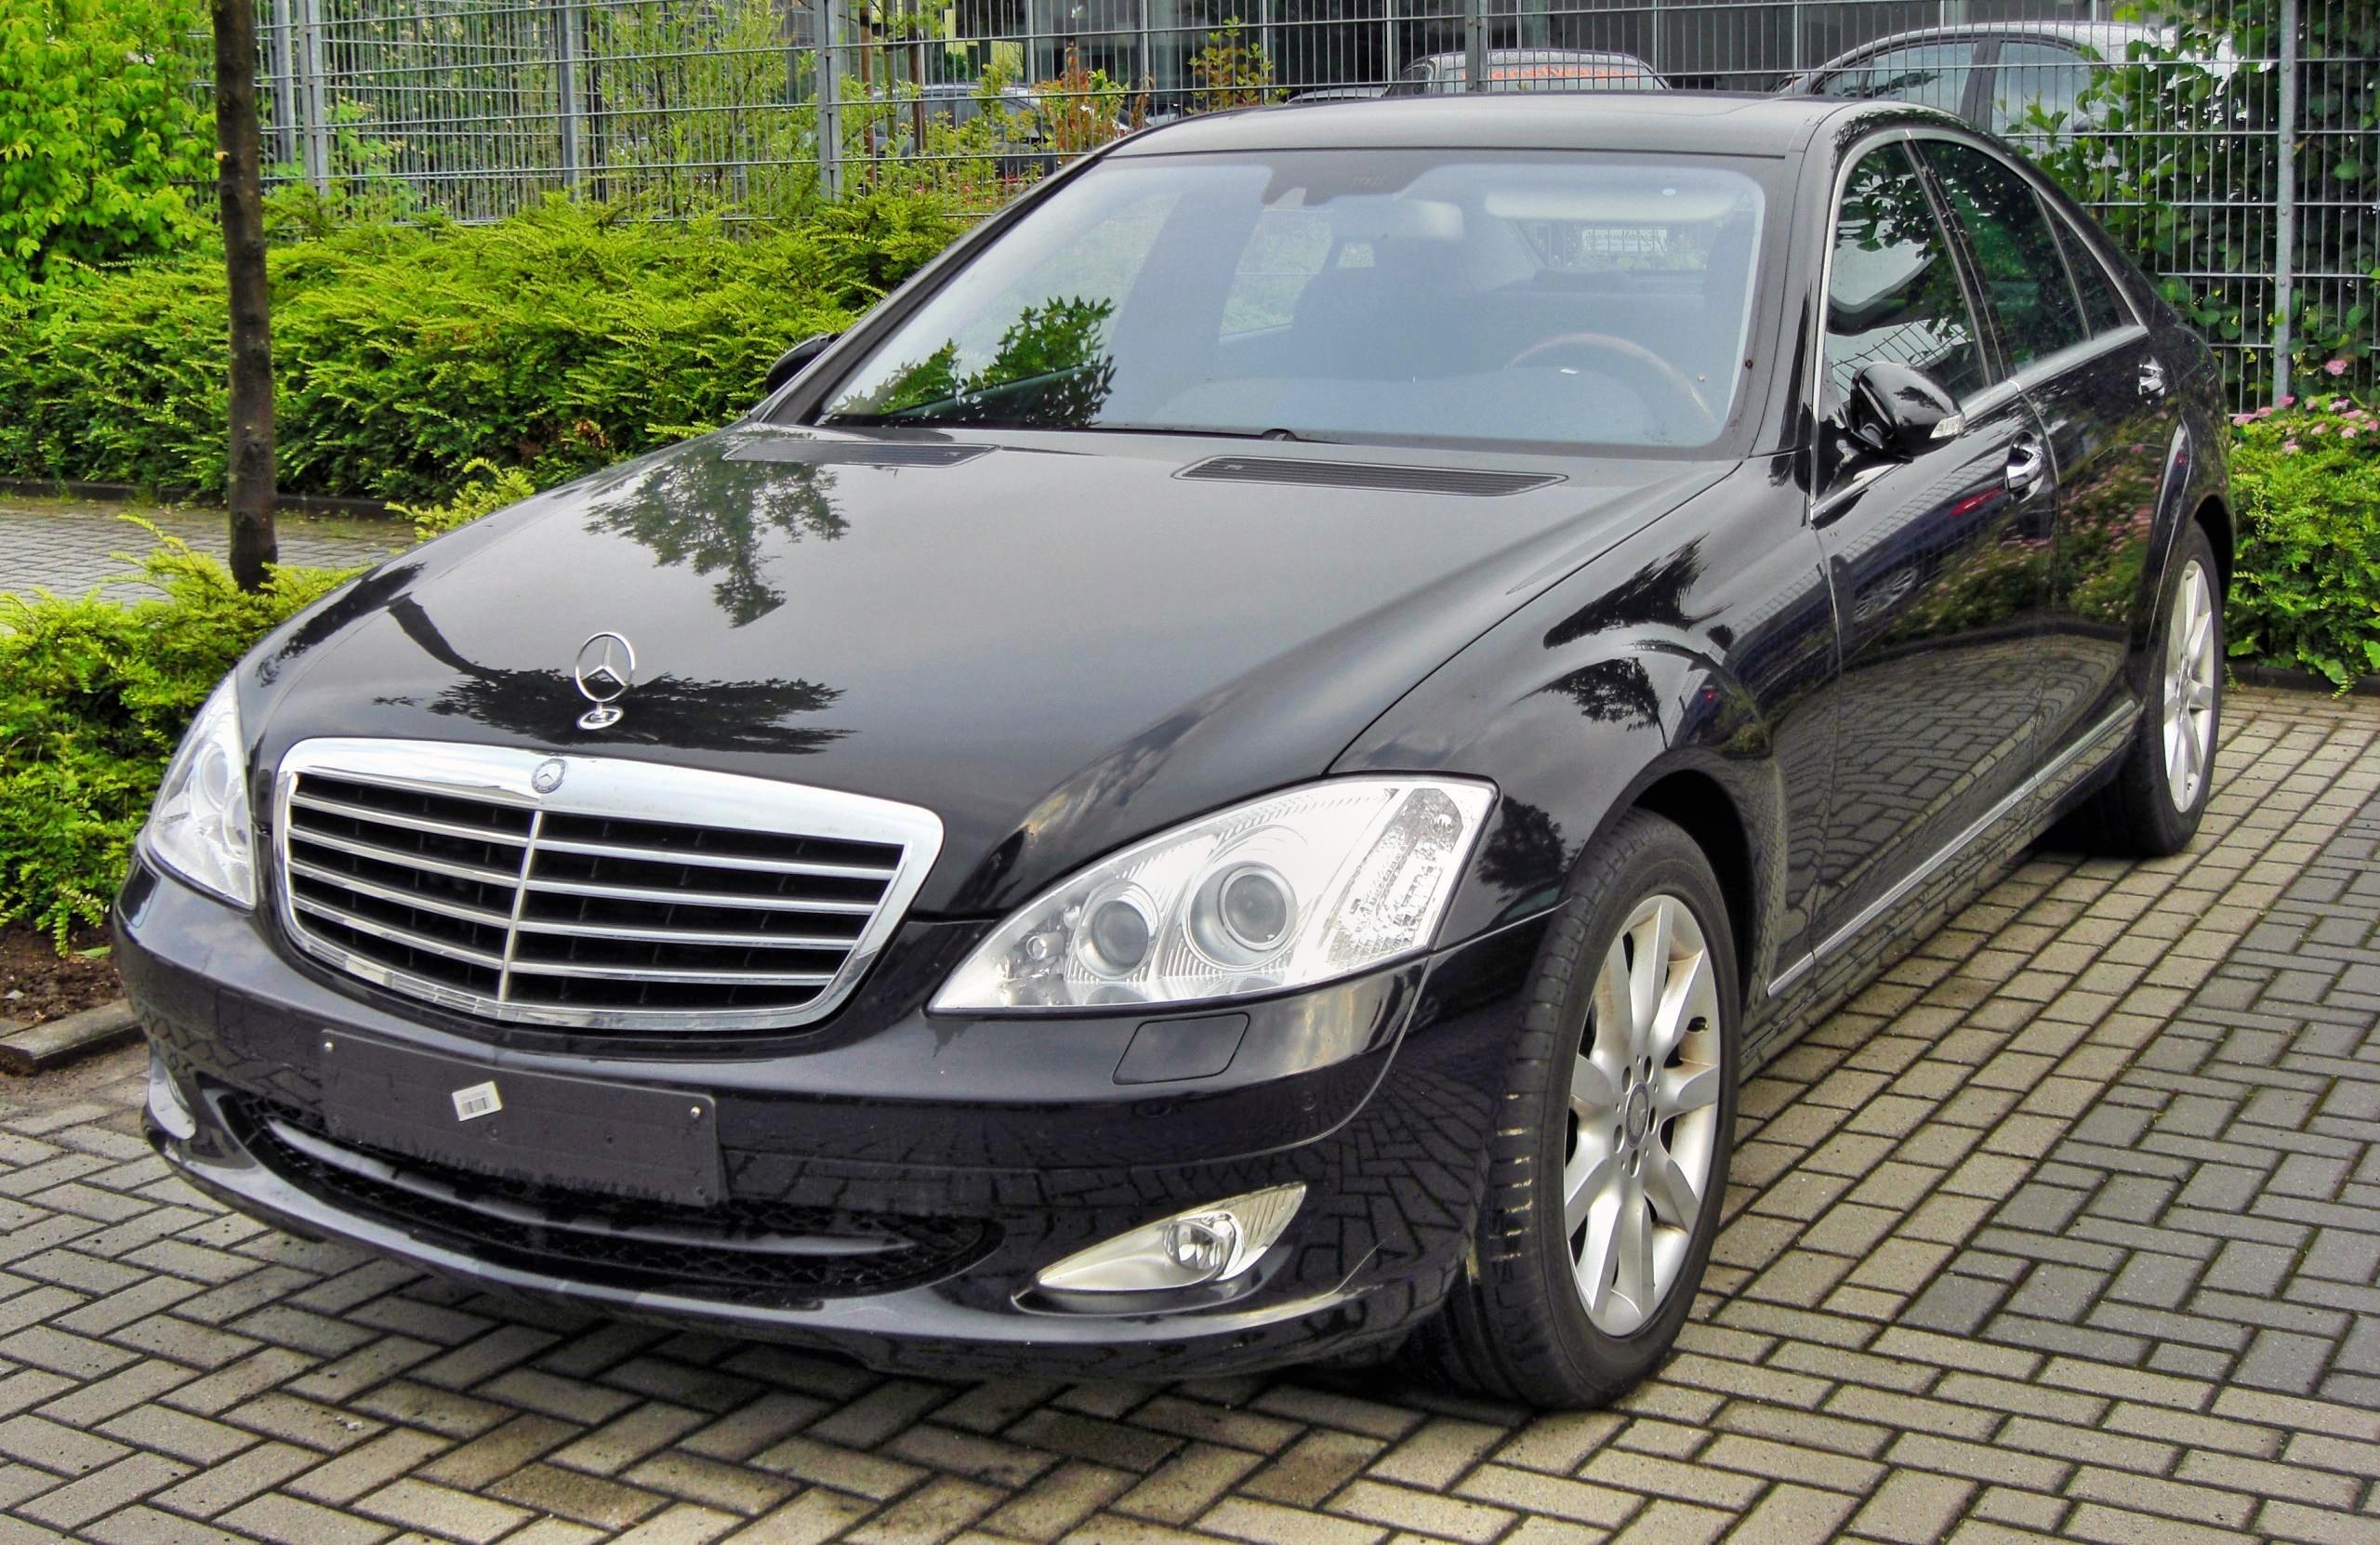 Mercedes benz w221 mercedes benz w221 for Mercedes benz of maryland